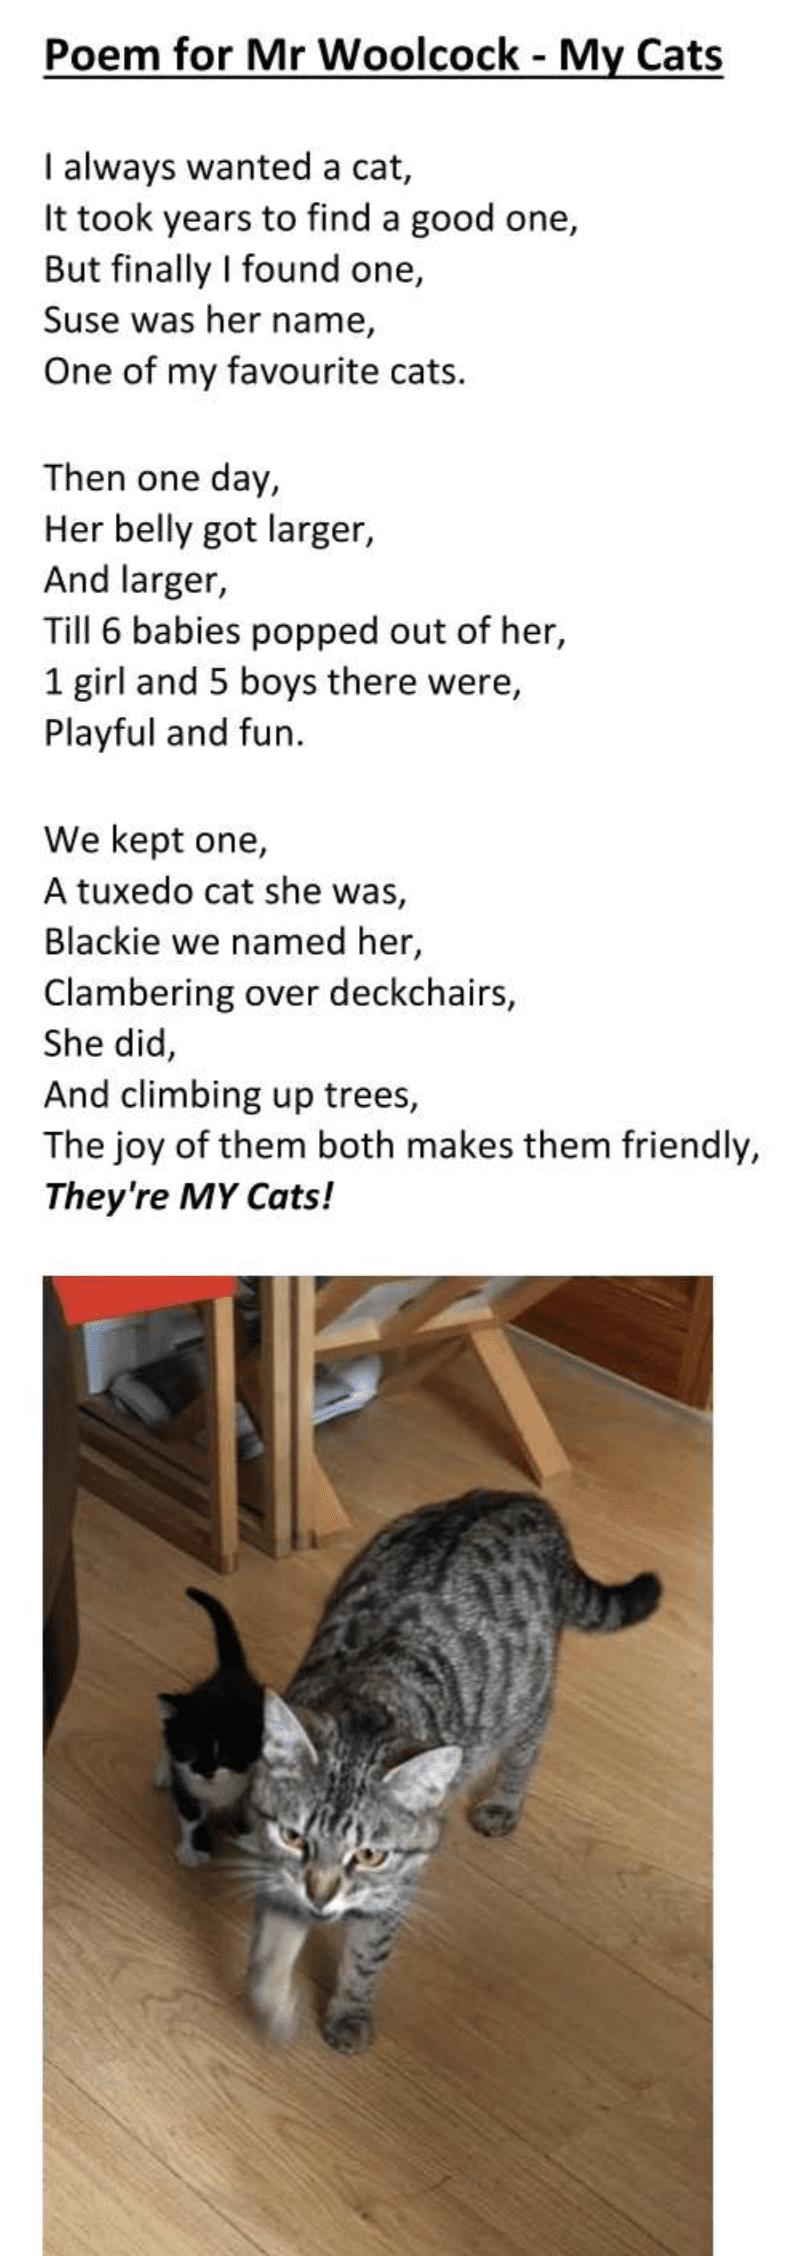 Poem Reuben